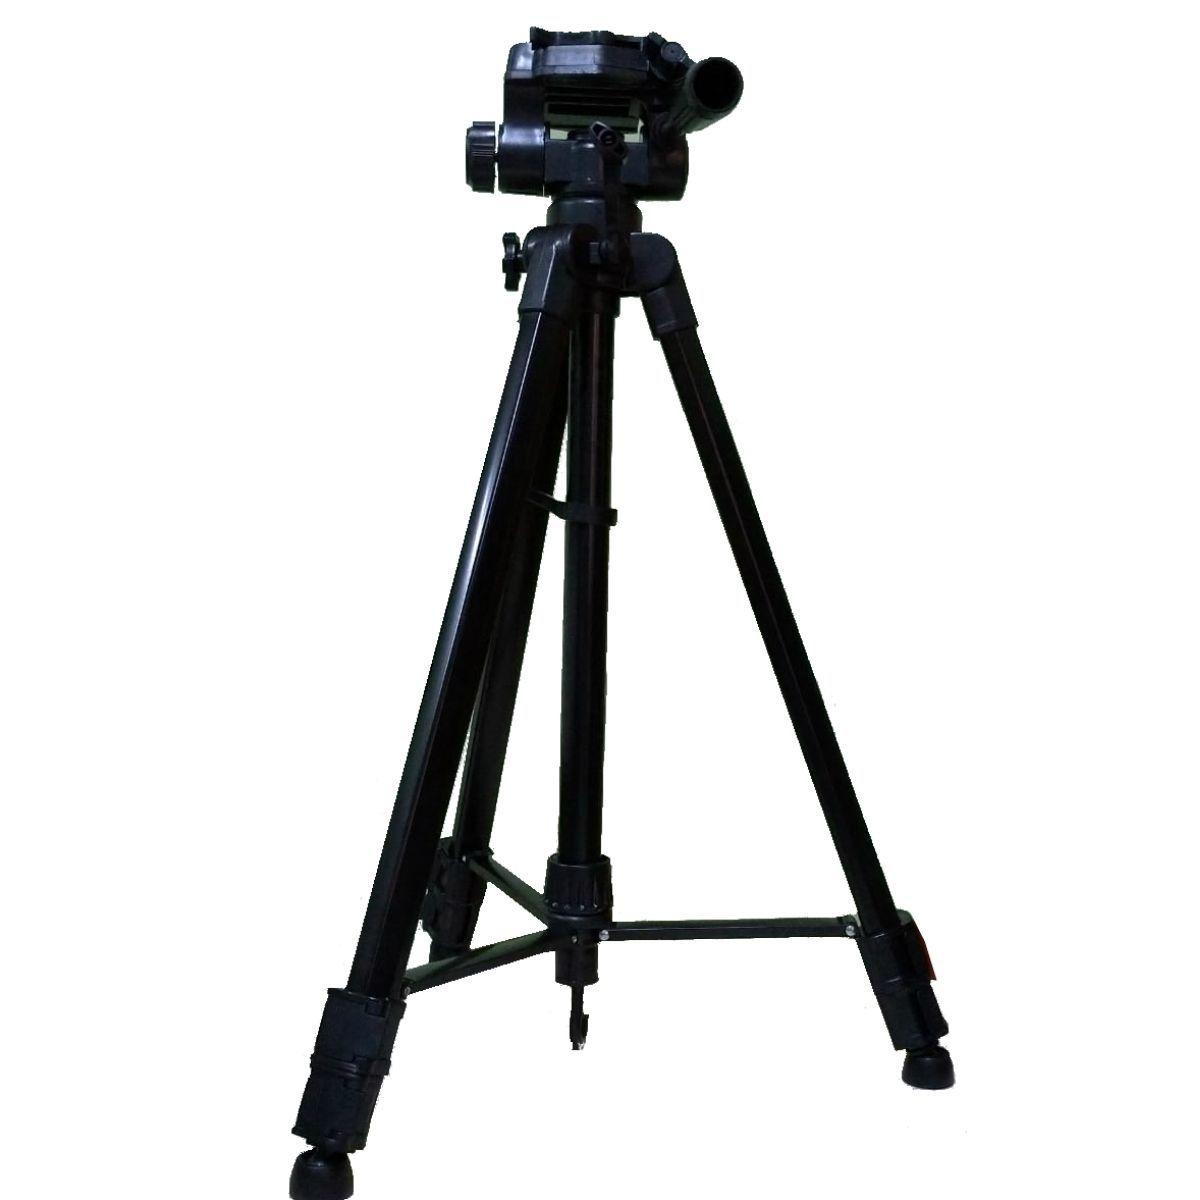 Tripé Fotográfico Profissional Sl3600 Deluxe Lightweight